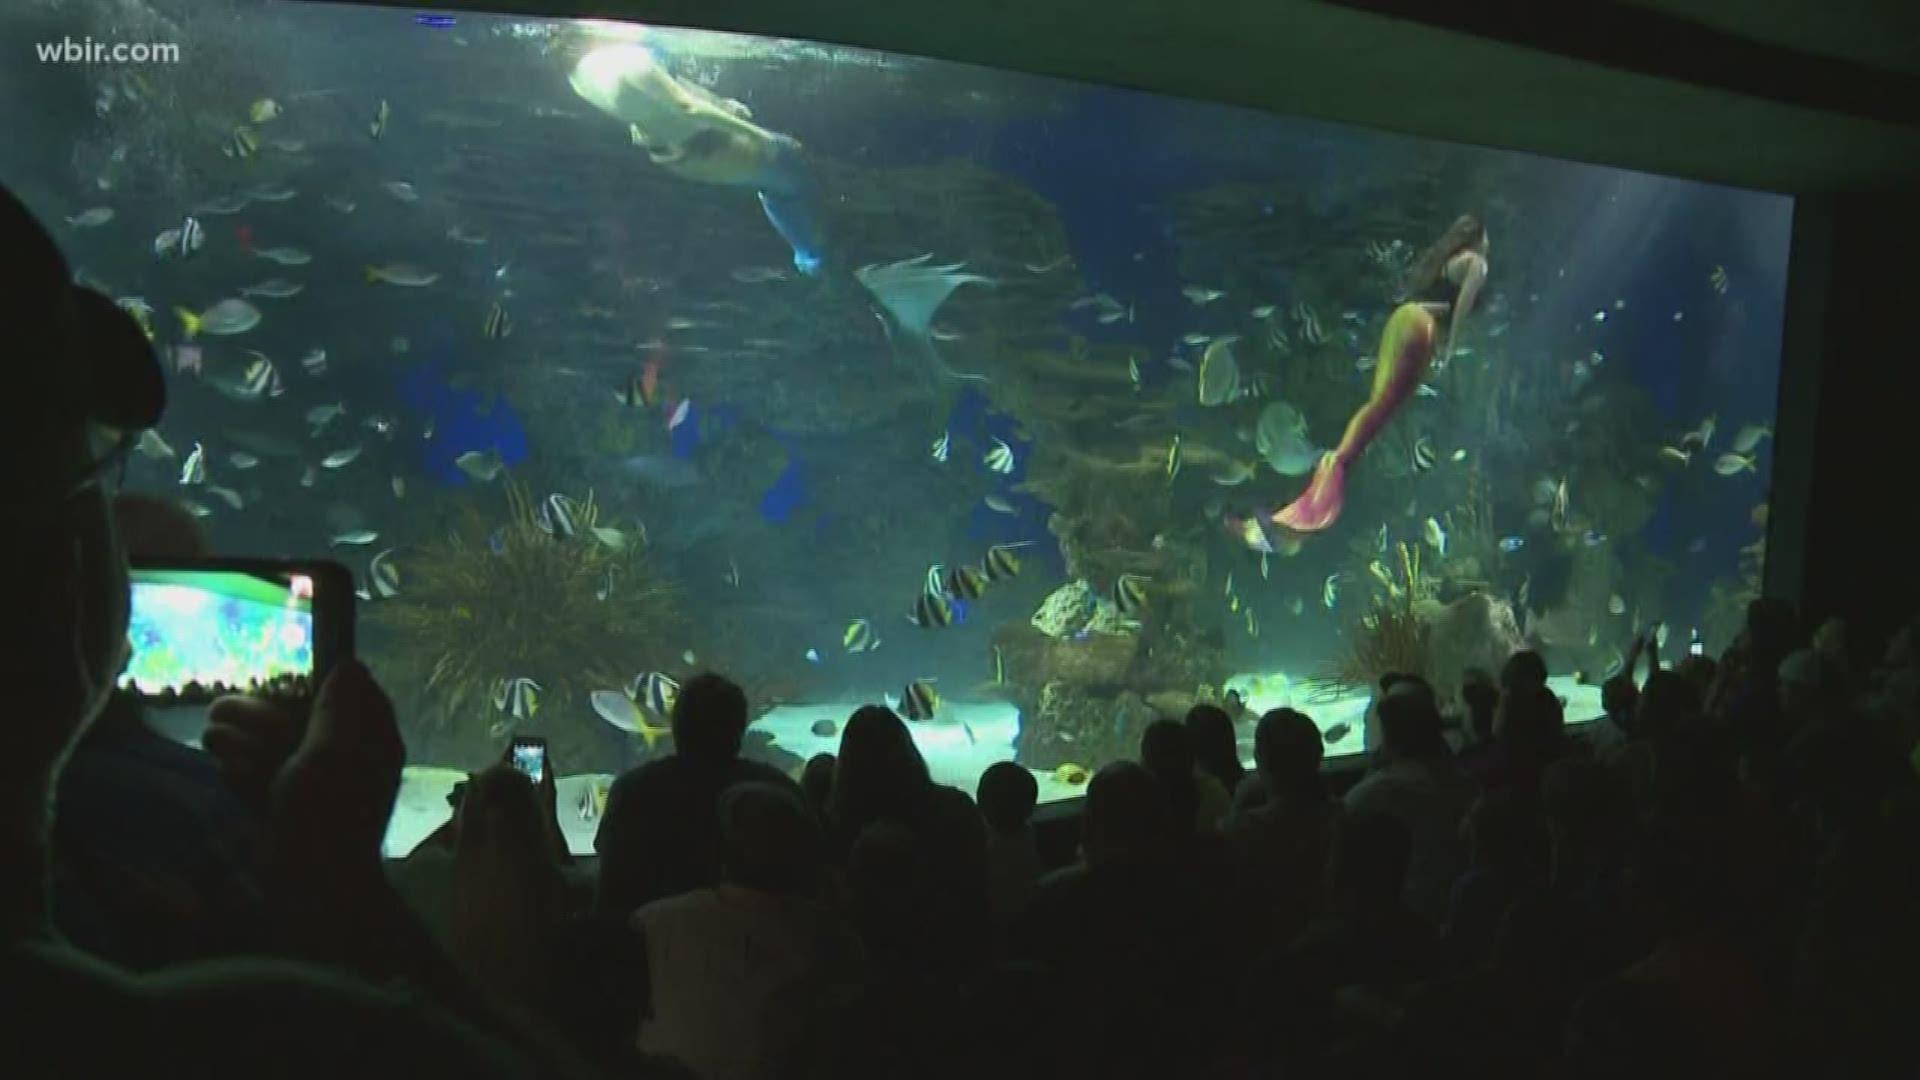 Mermaids make a splash at Ripley's Aquarium of the Smokies ...